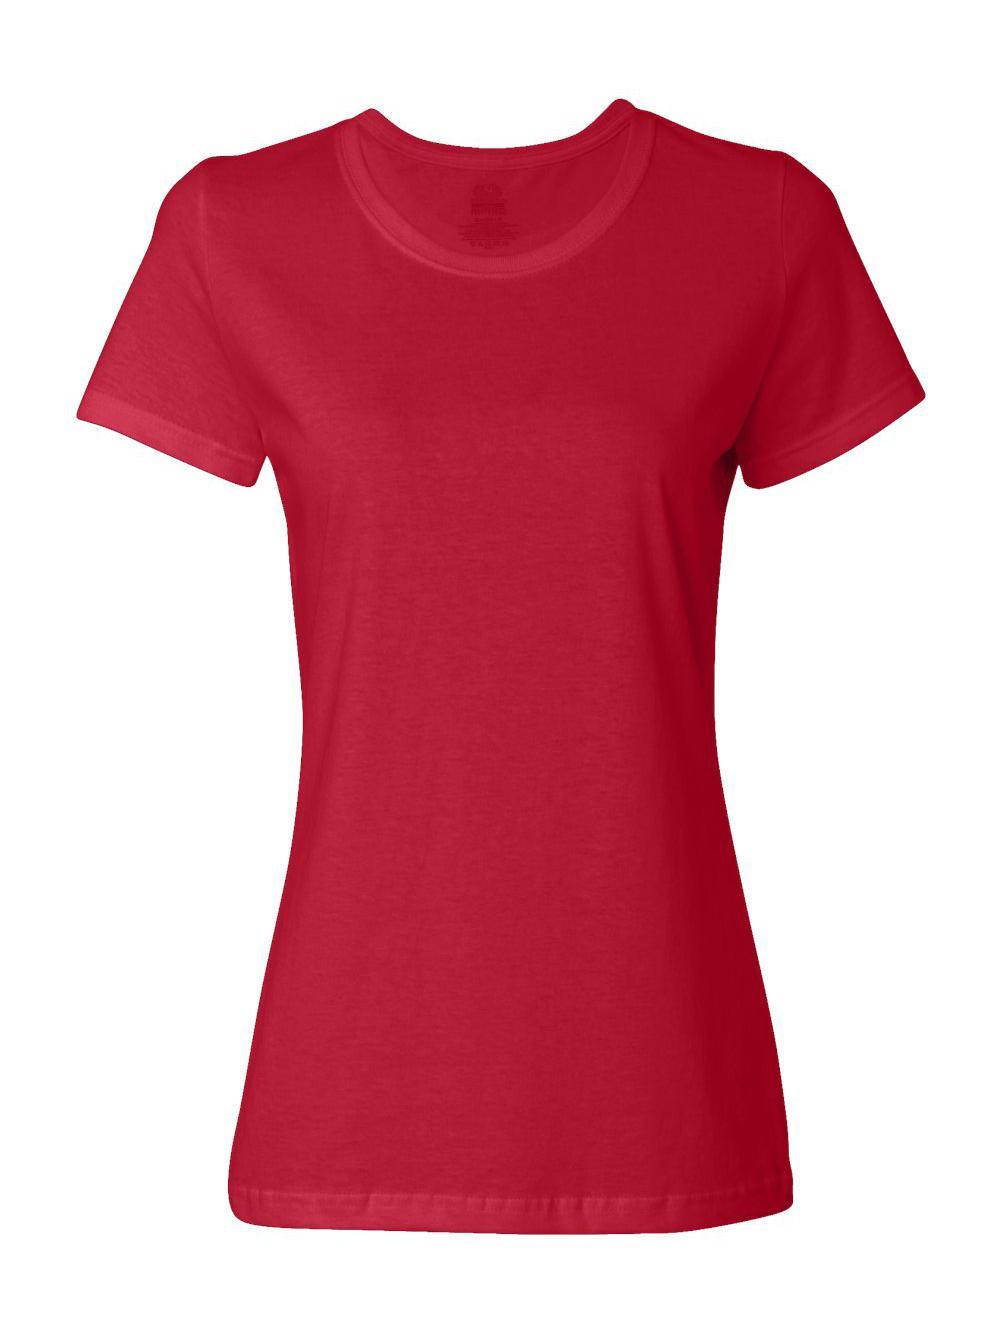 Fruit-of-the-Loom-HD-Cotton-Women-039-s-Short-Sleeve-T-Shirt-L3930R thumbnail 36